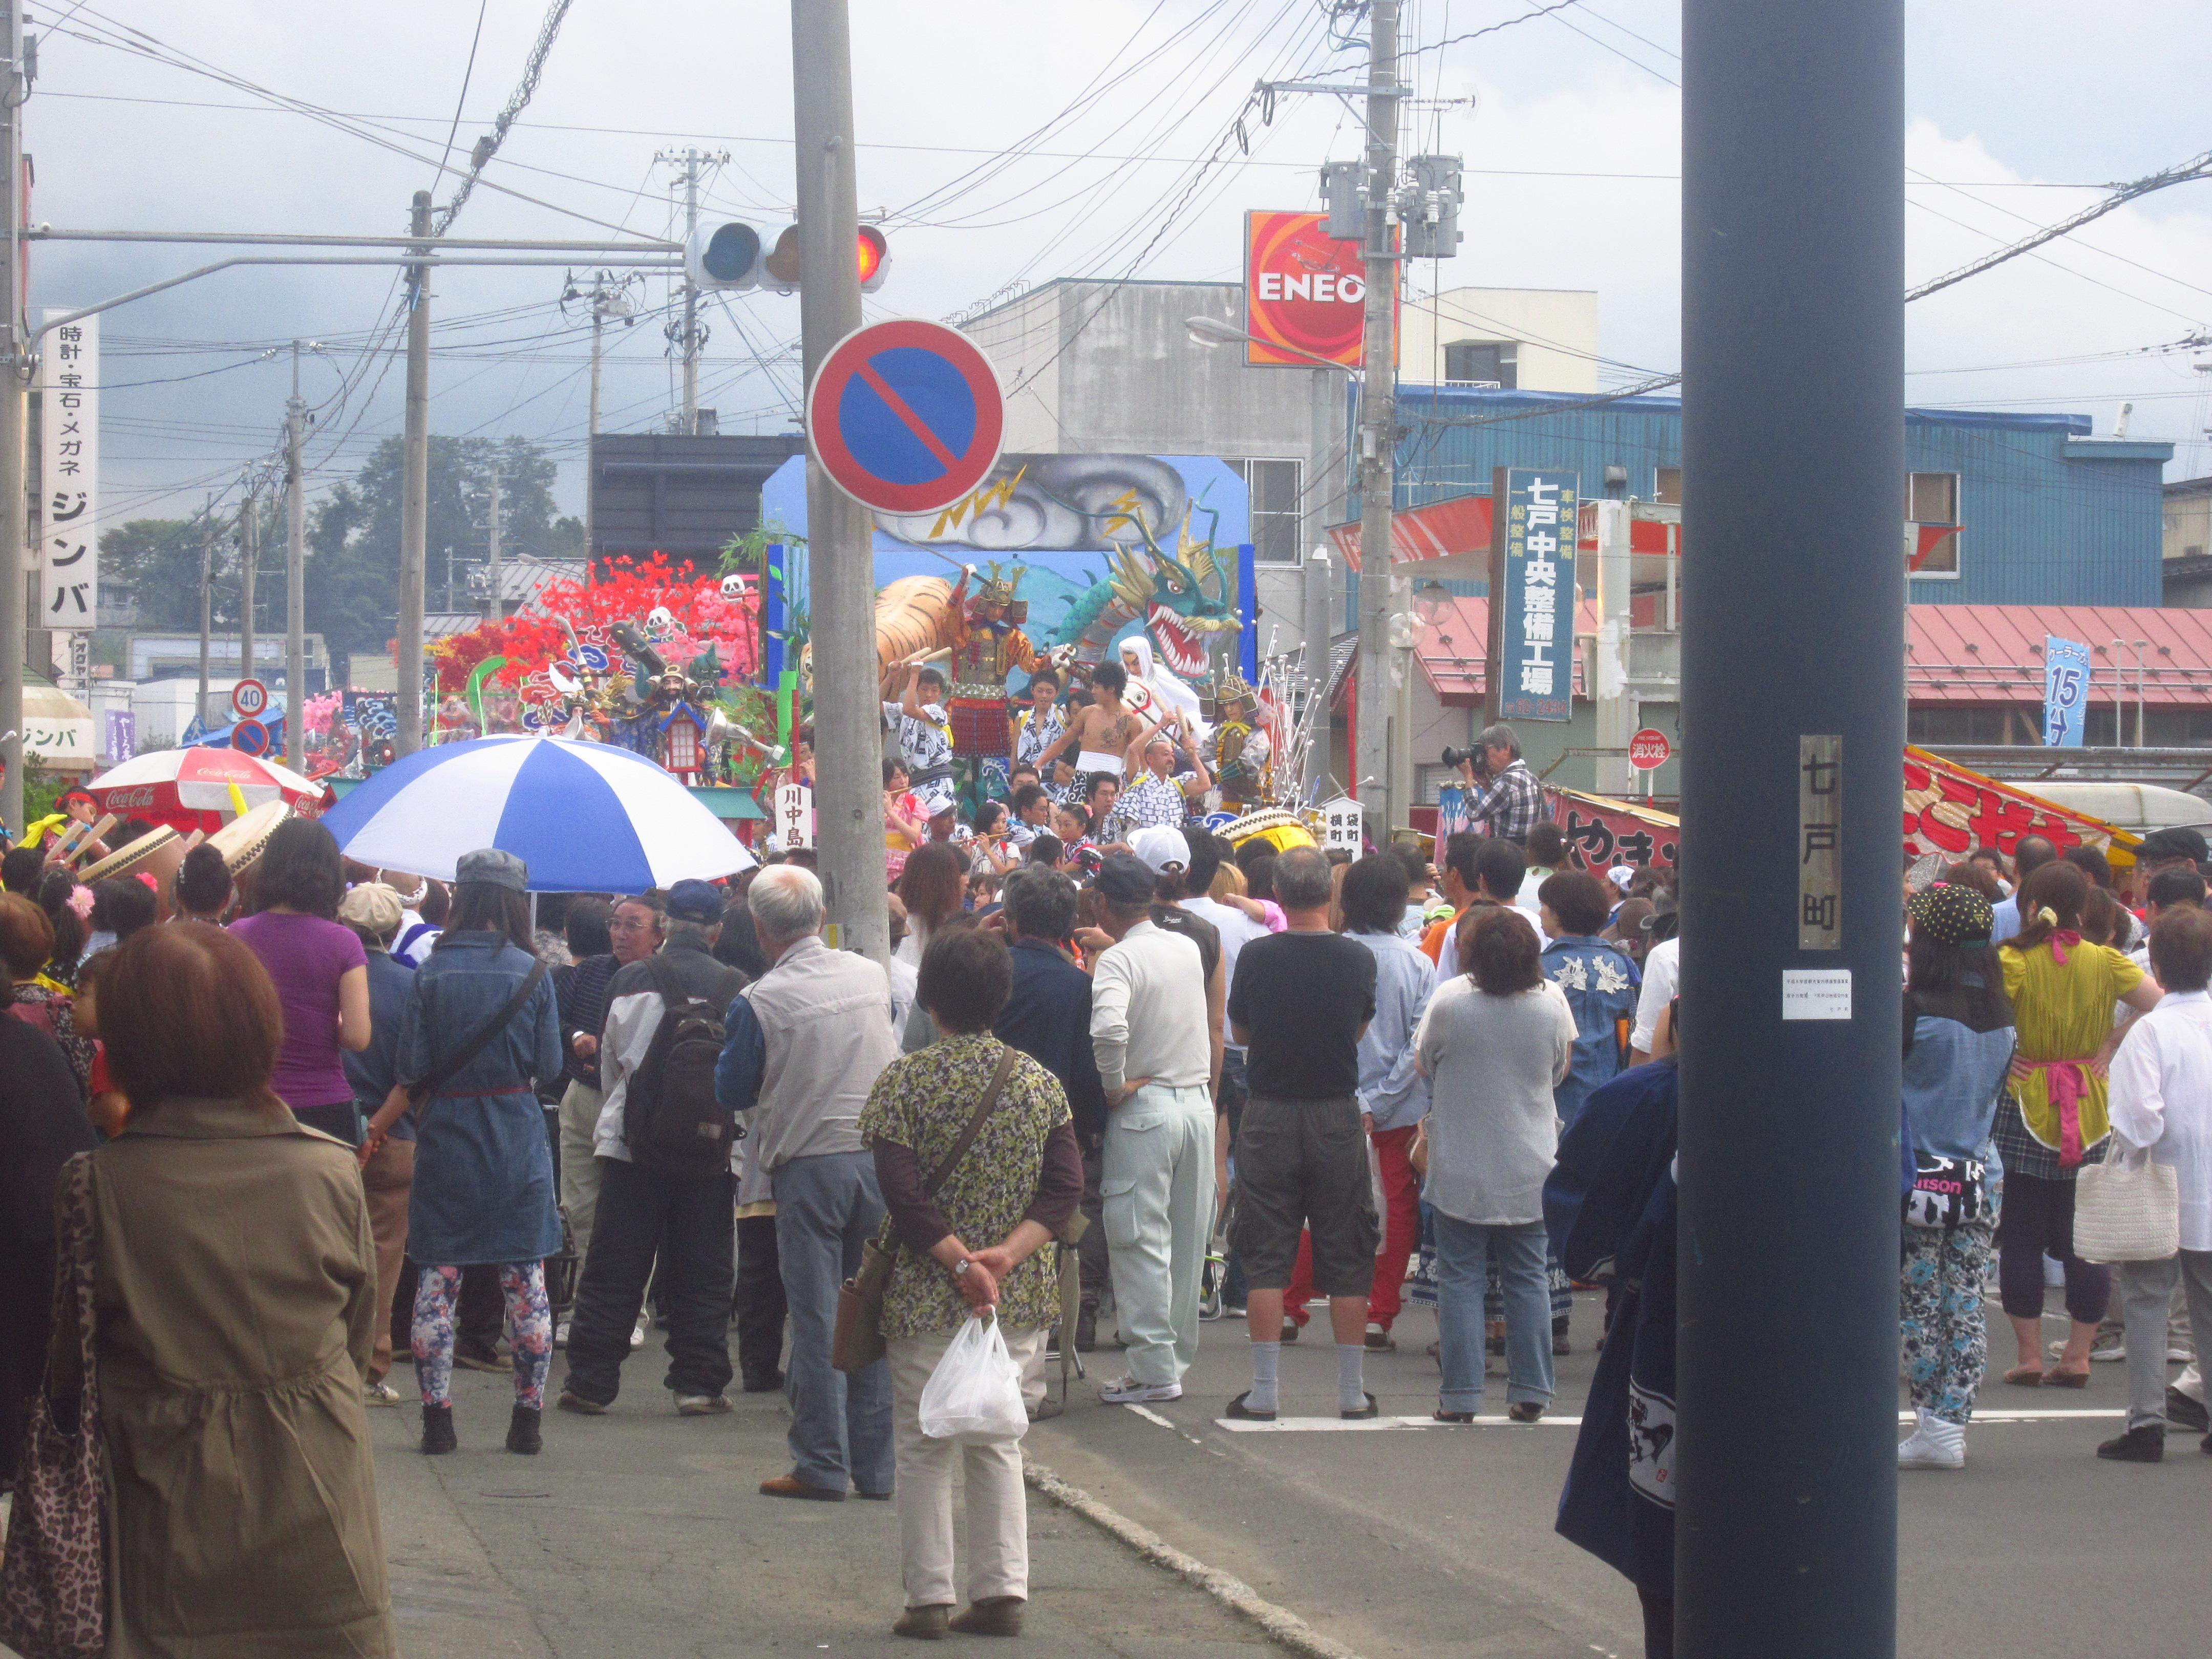 IMG 4273 - 麻布十番納涼祭り25,26日(七戸町出店)